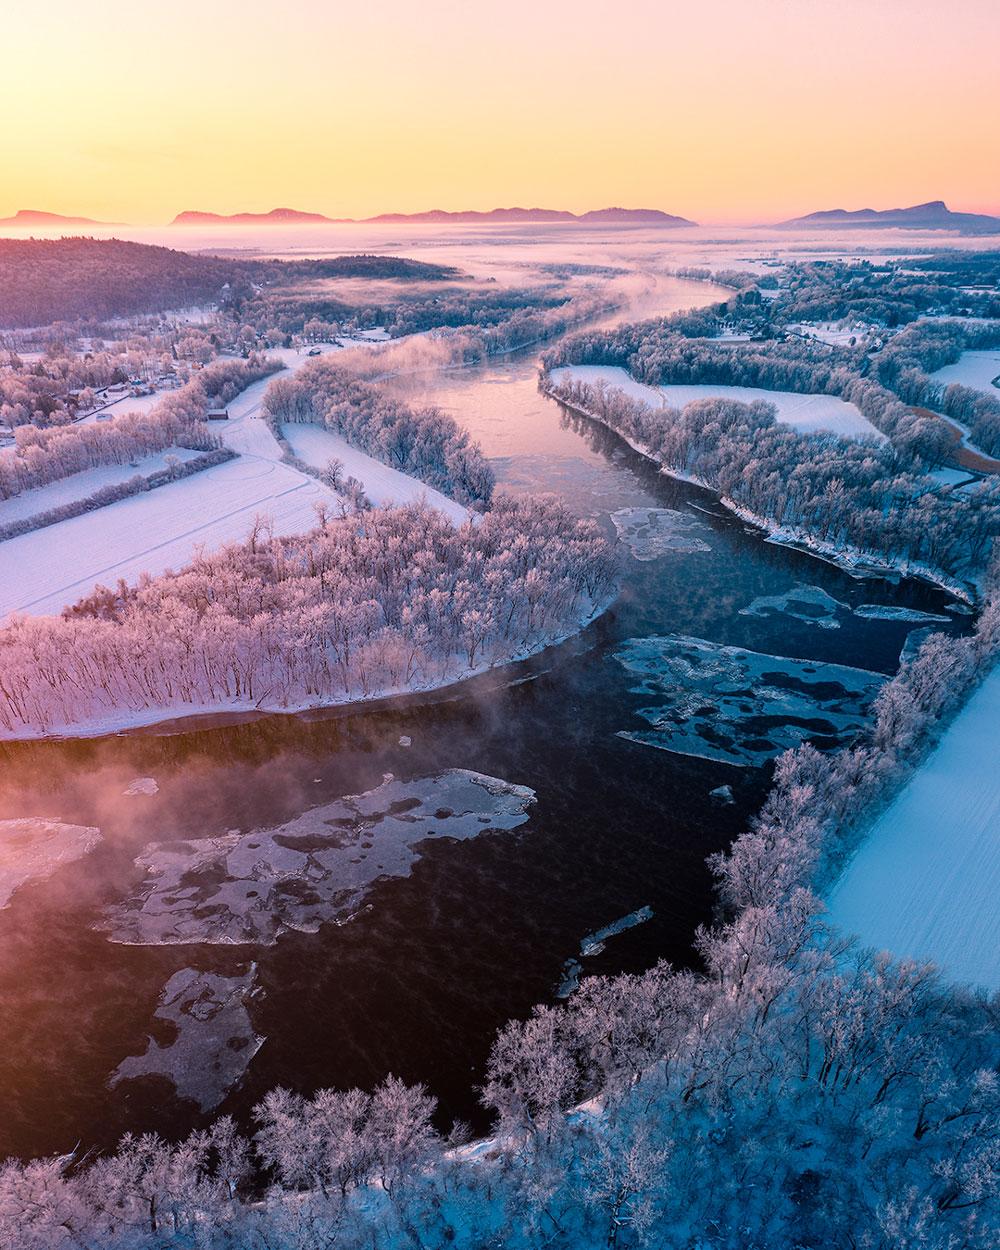 'Sunrise at -5°F' by @jamiemalcolmbrown – Hatfield, Massachusetts